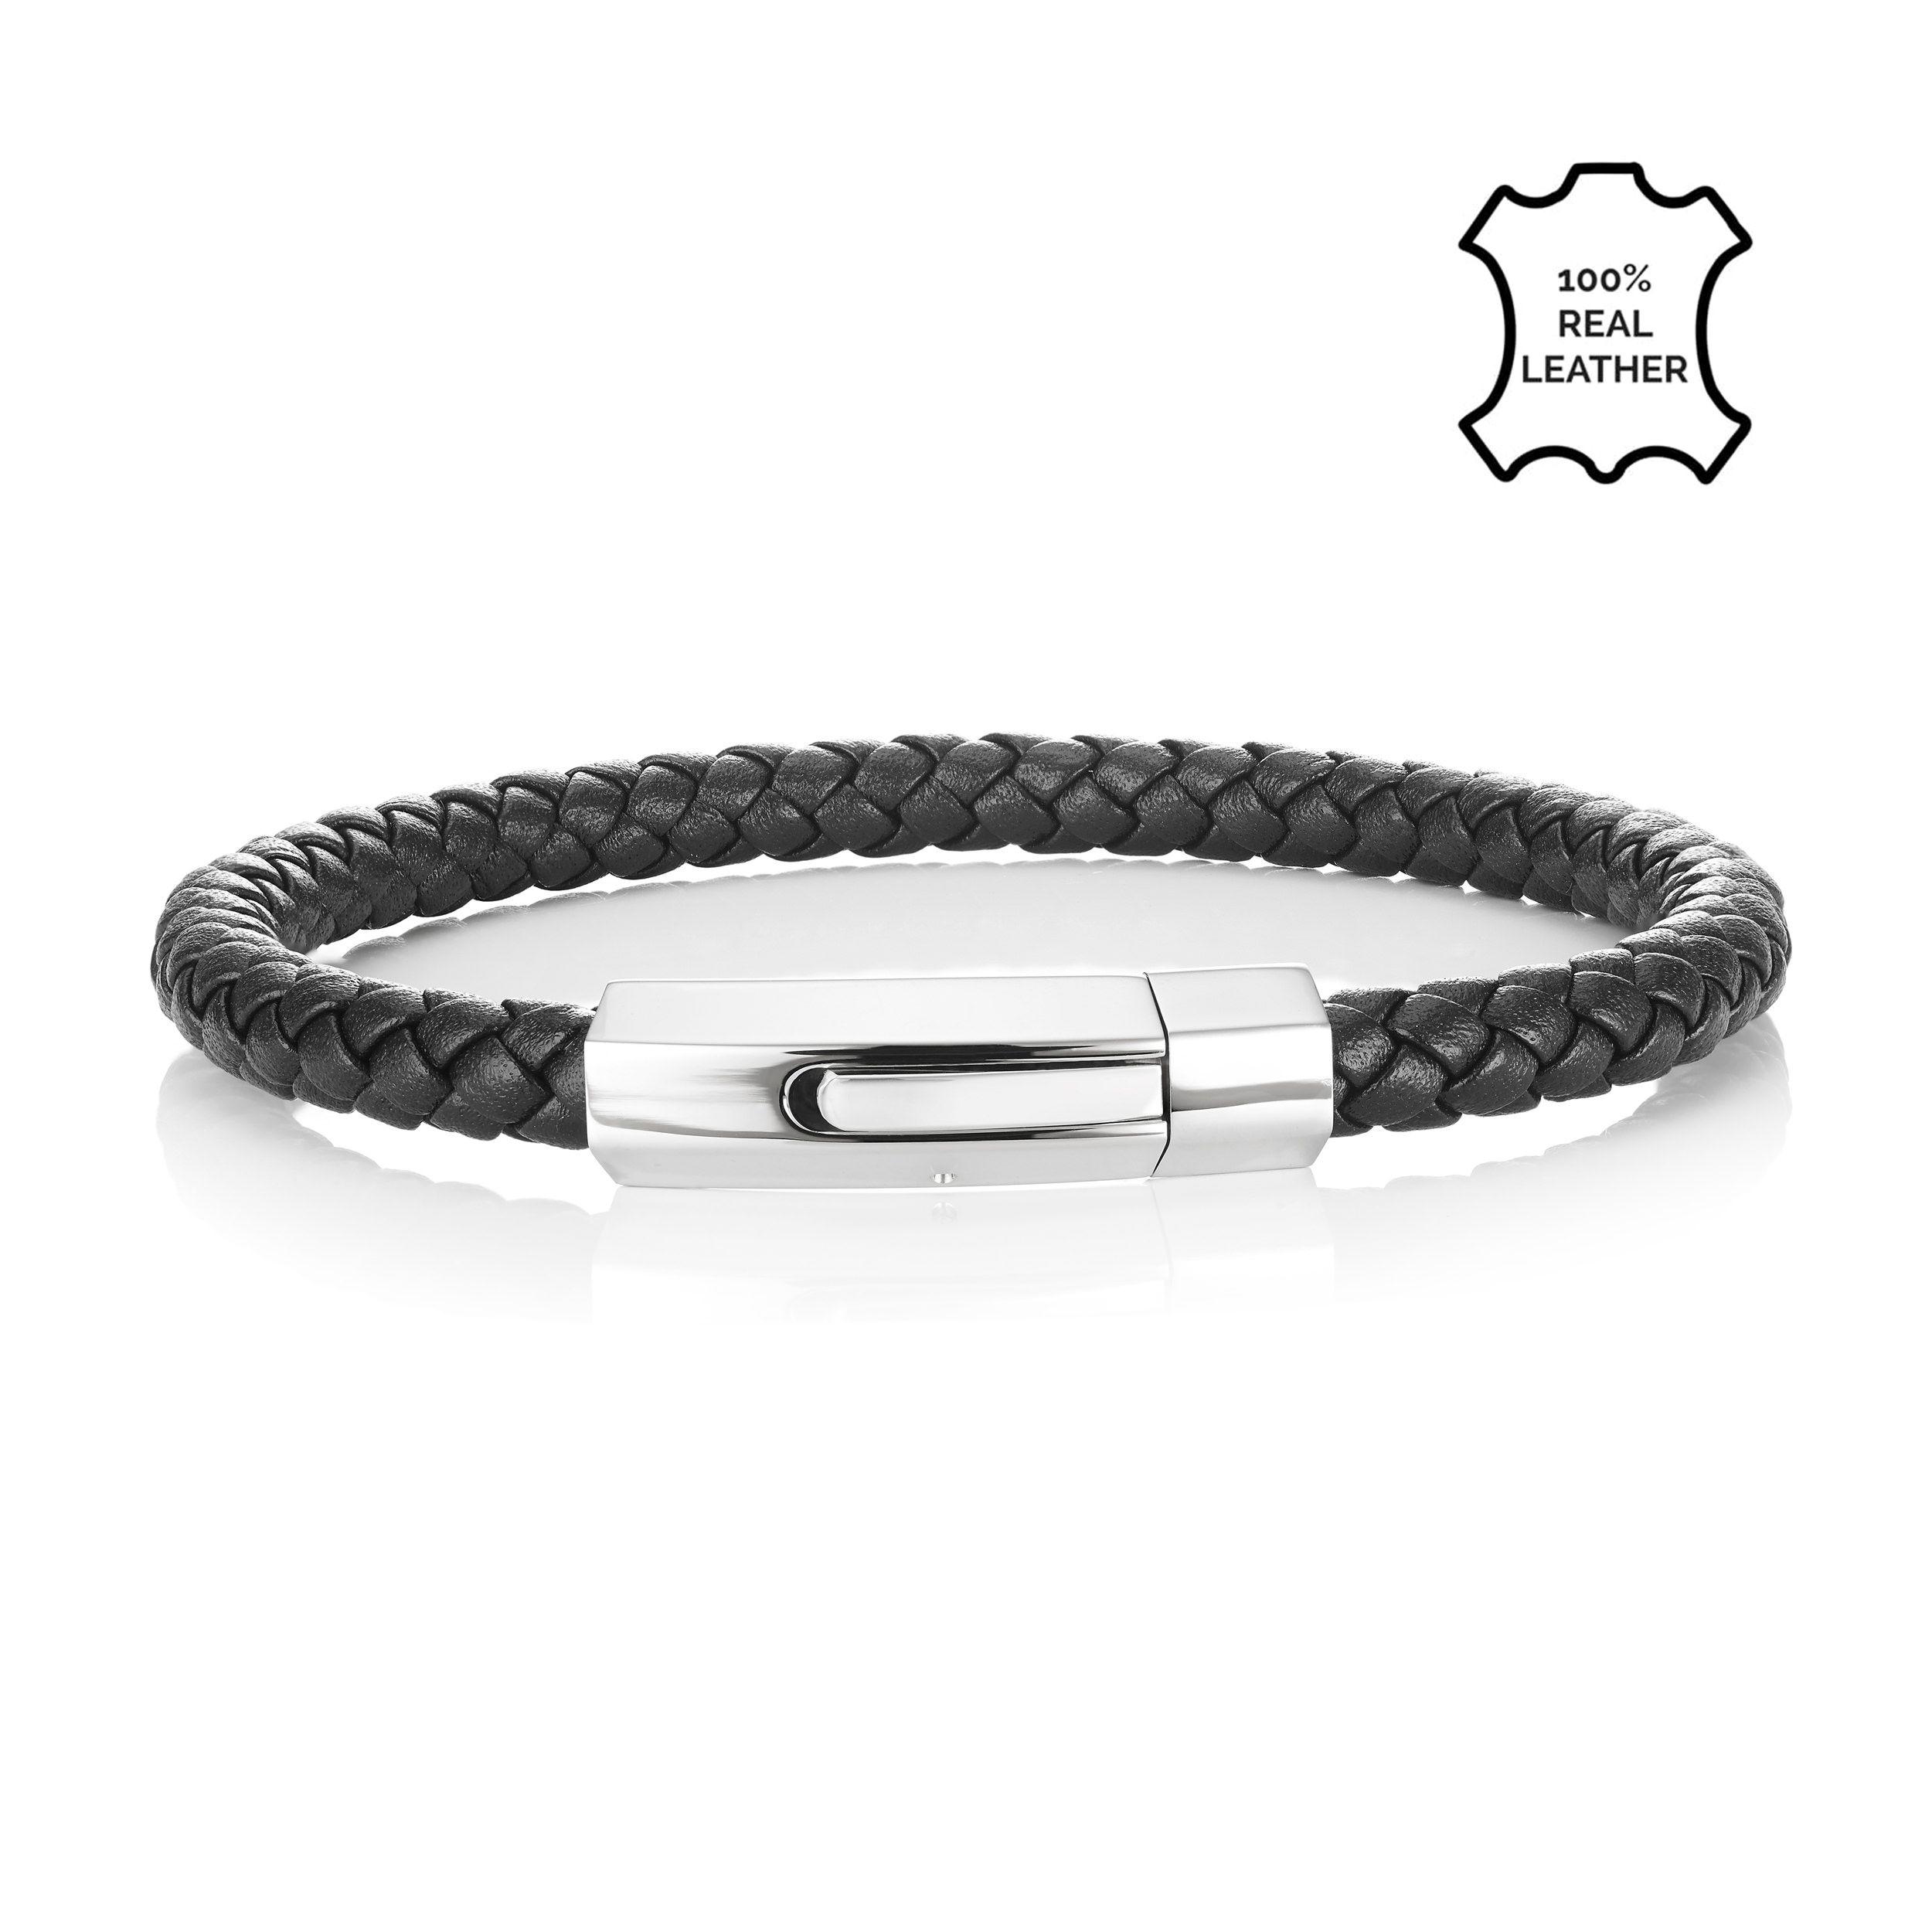 Buckley London Men's Axel Hexagonal Clasp Leather Bracelet